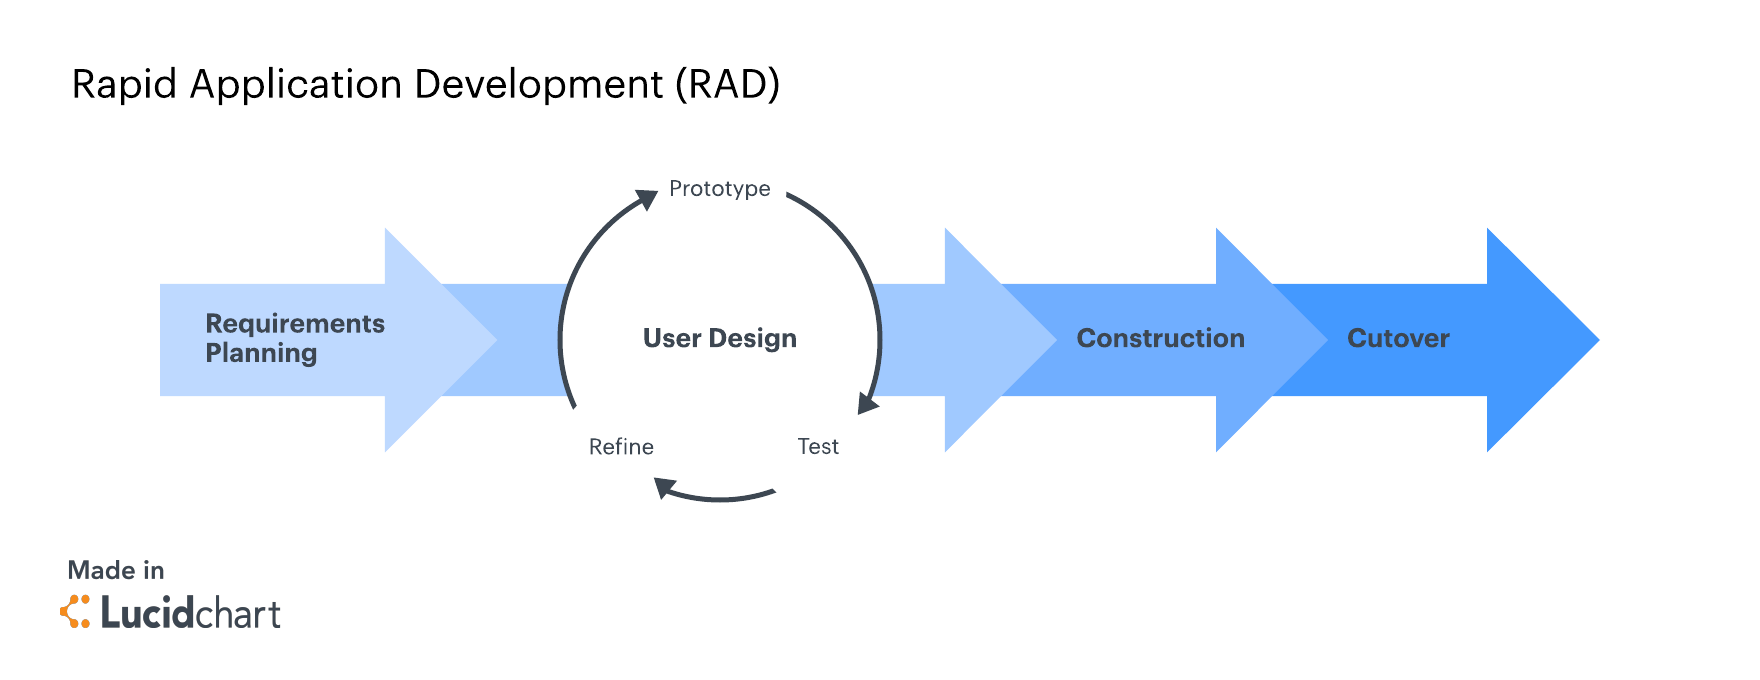 rapid application development methodology